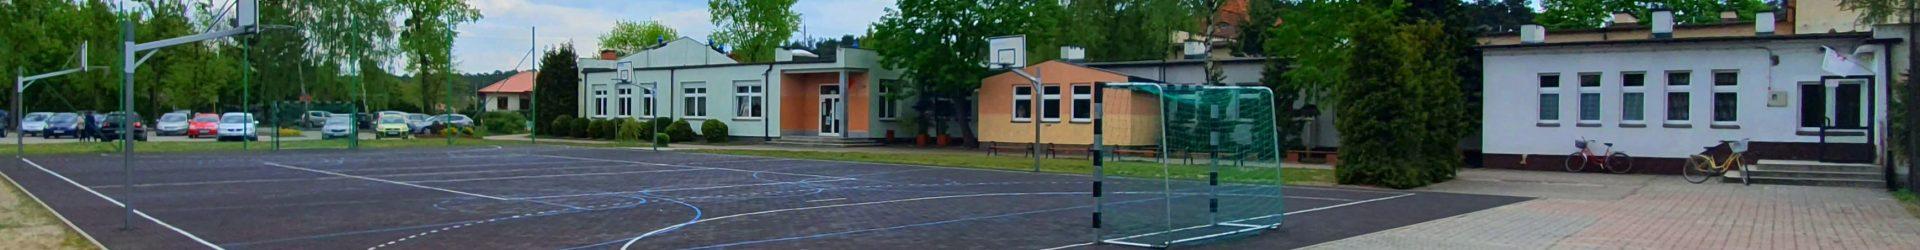 Obwód szkoły